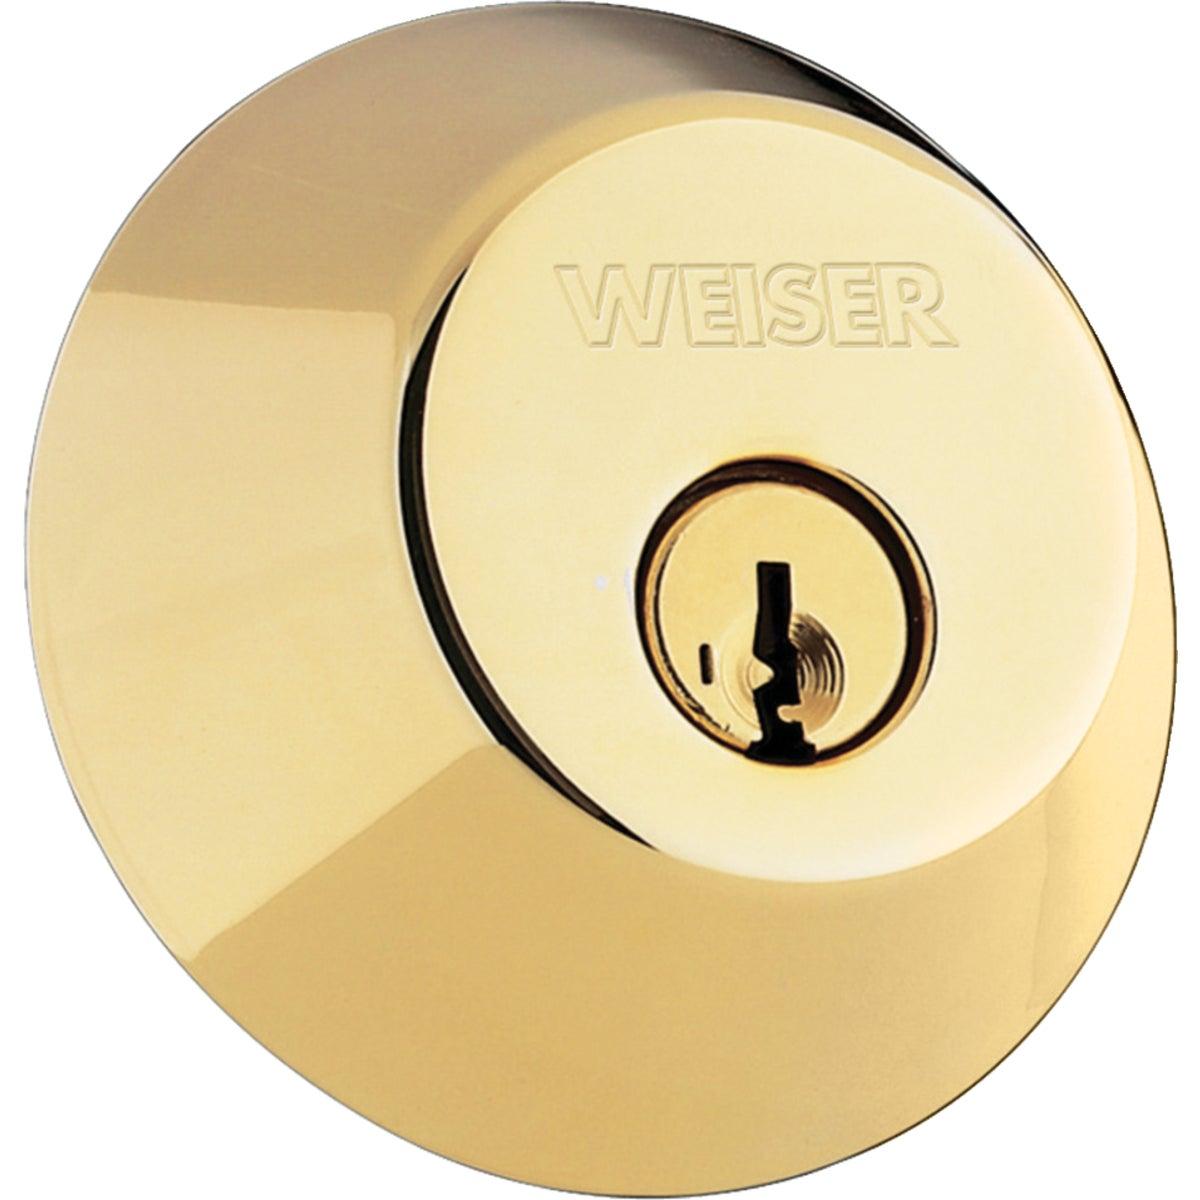 Weiser Lock PB 1CYL SK DEADBOLT GD9471X 3BR SMT K4